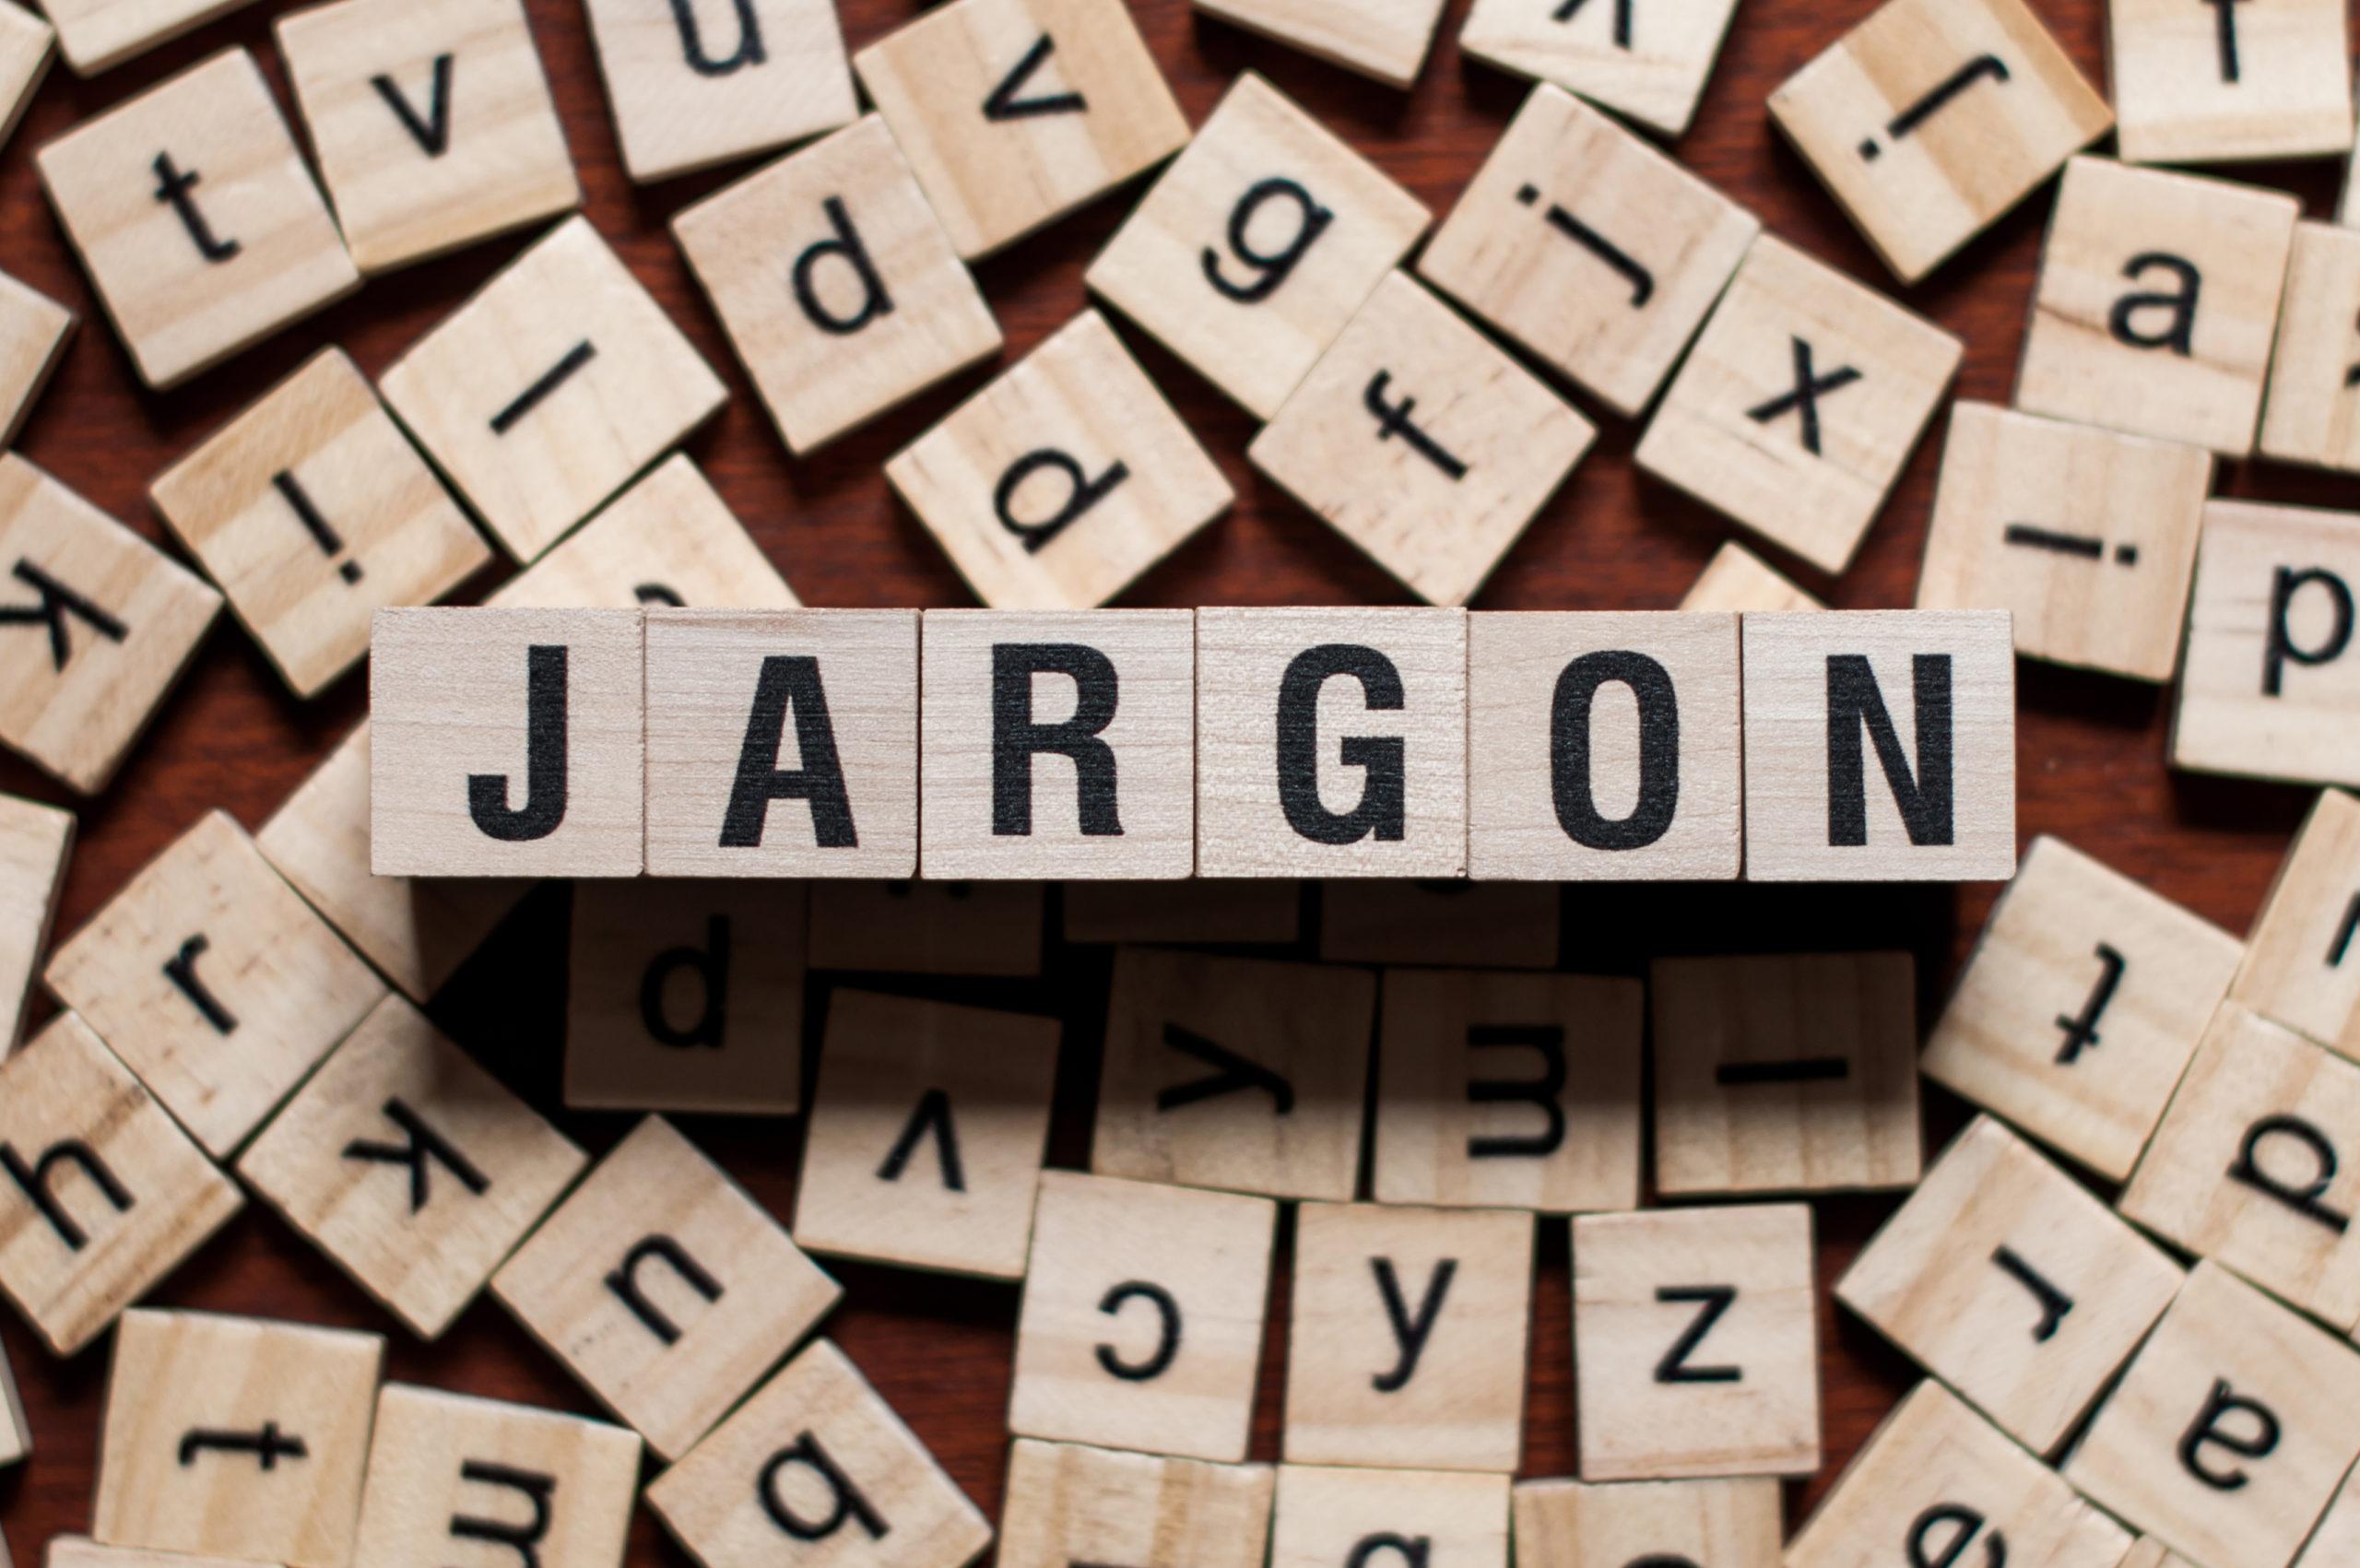 Jargon Word Written On Wood